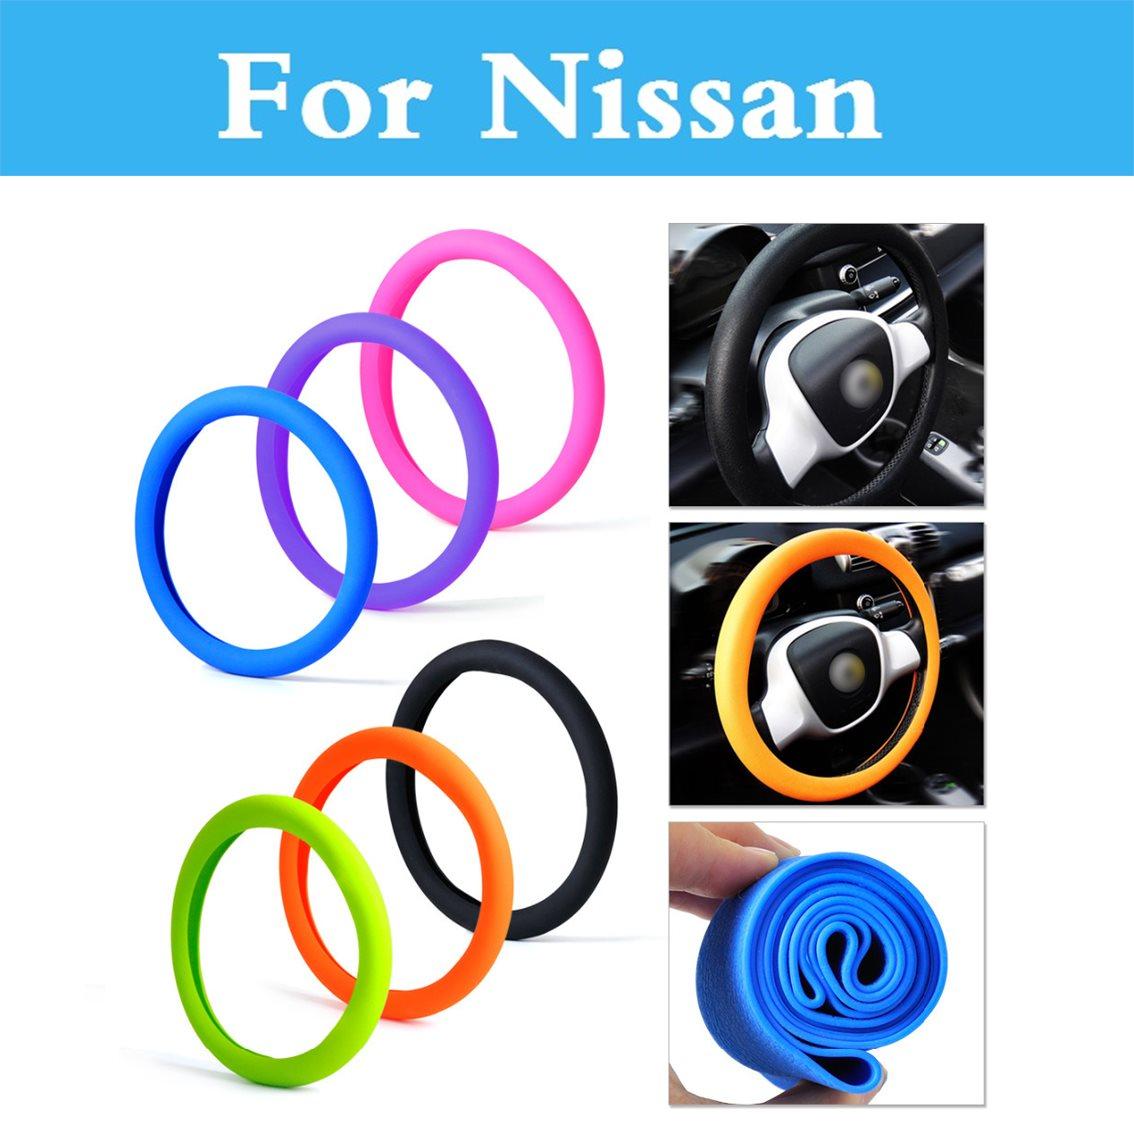 Silicone Steering Wheel Cover Shell Skidproof Odorless For Nissan Altima Armada Avenir Juke 350Z Nismo 370Z AD Almera Classic